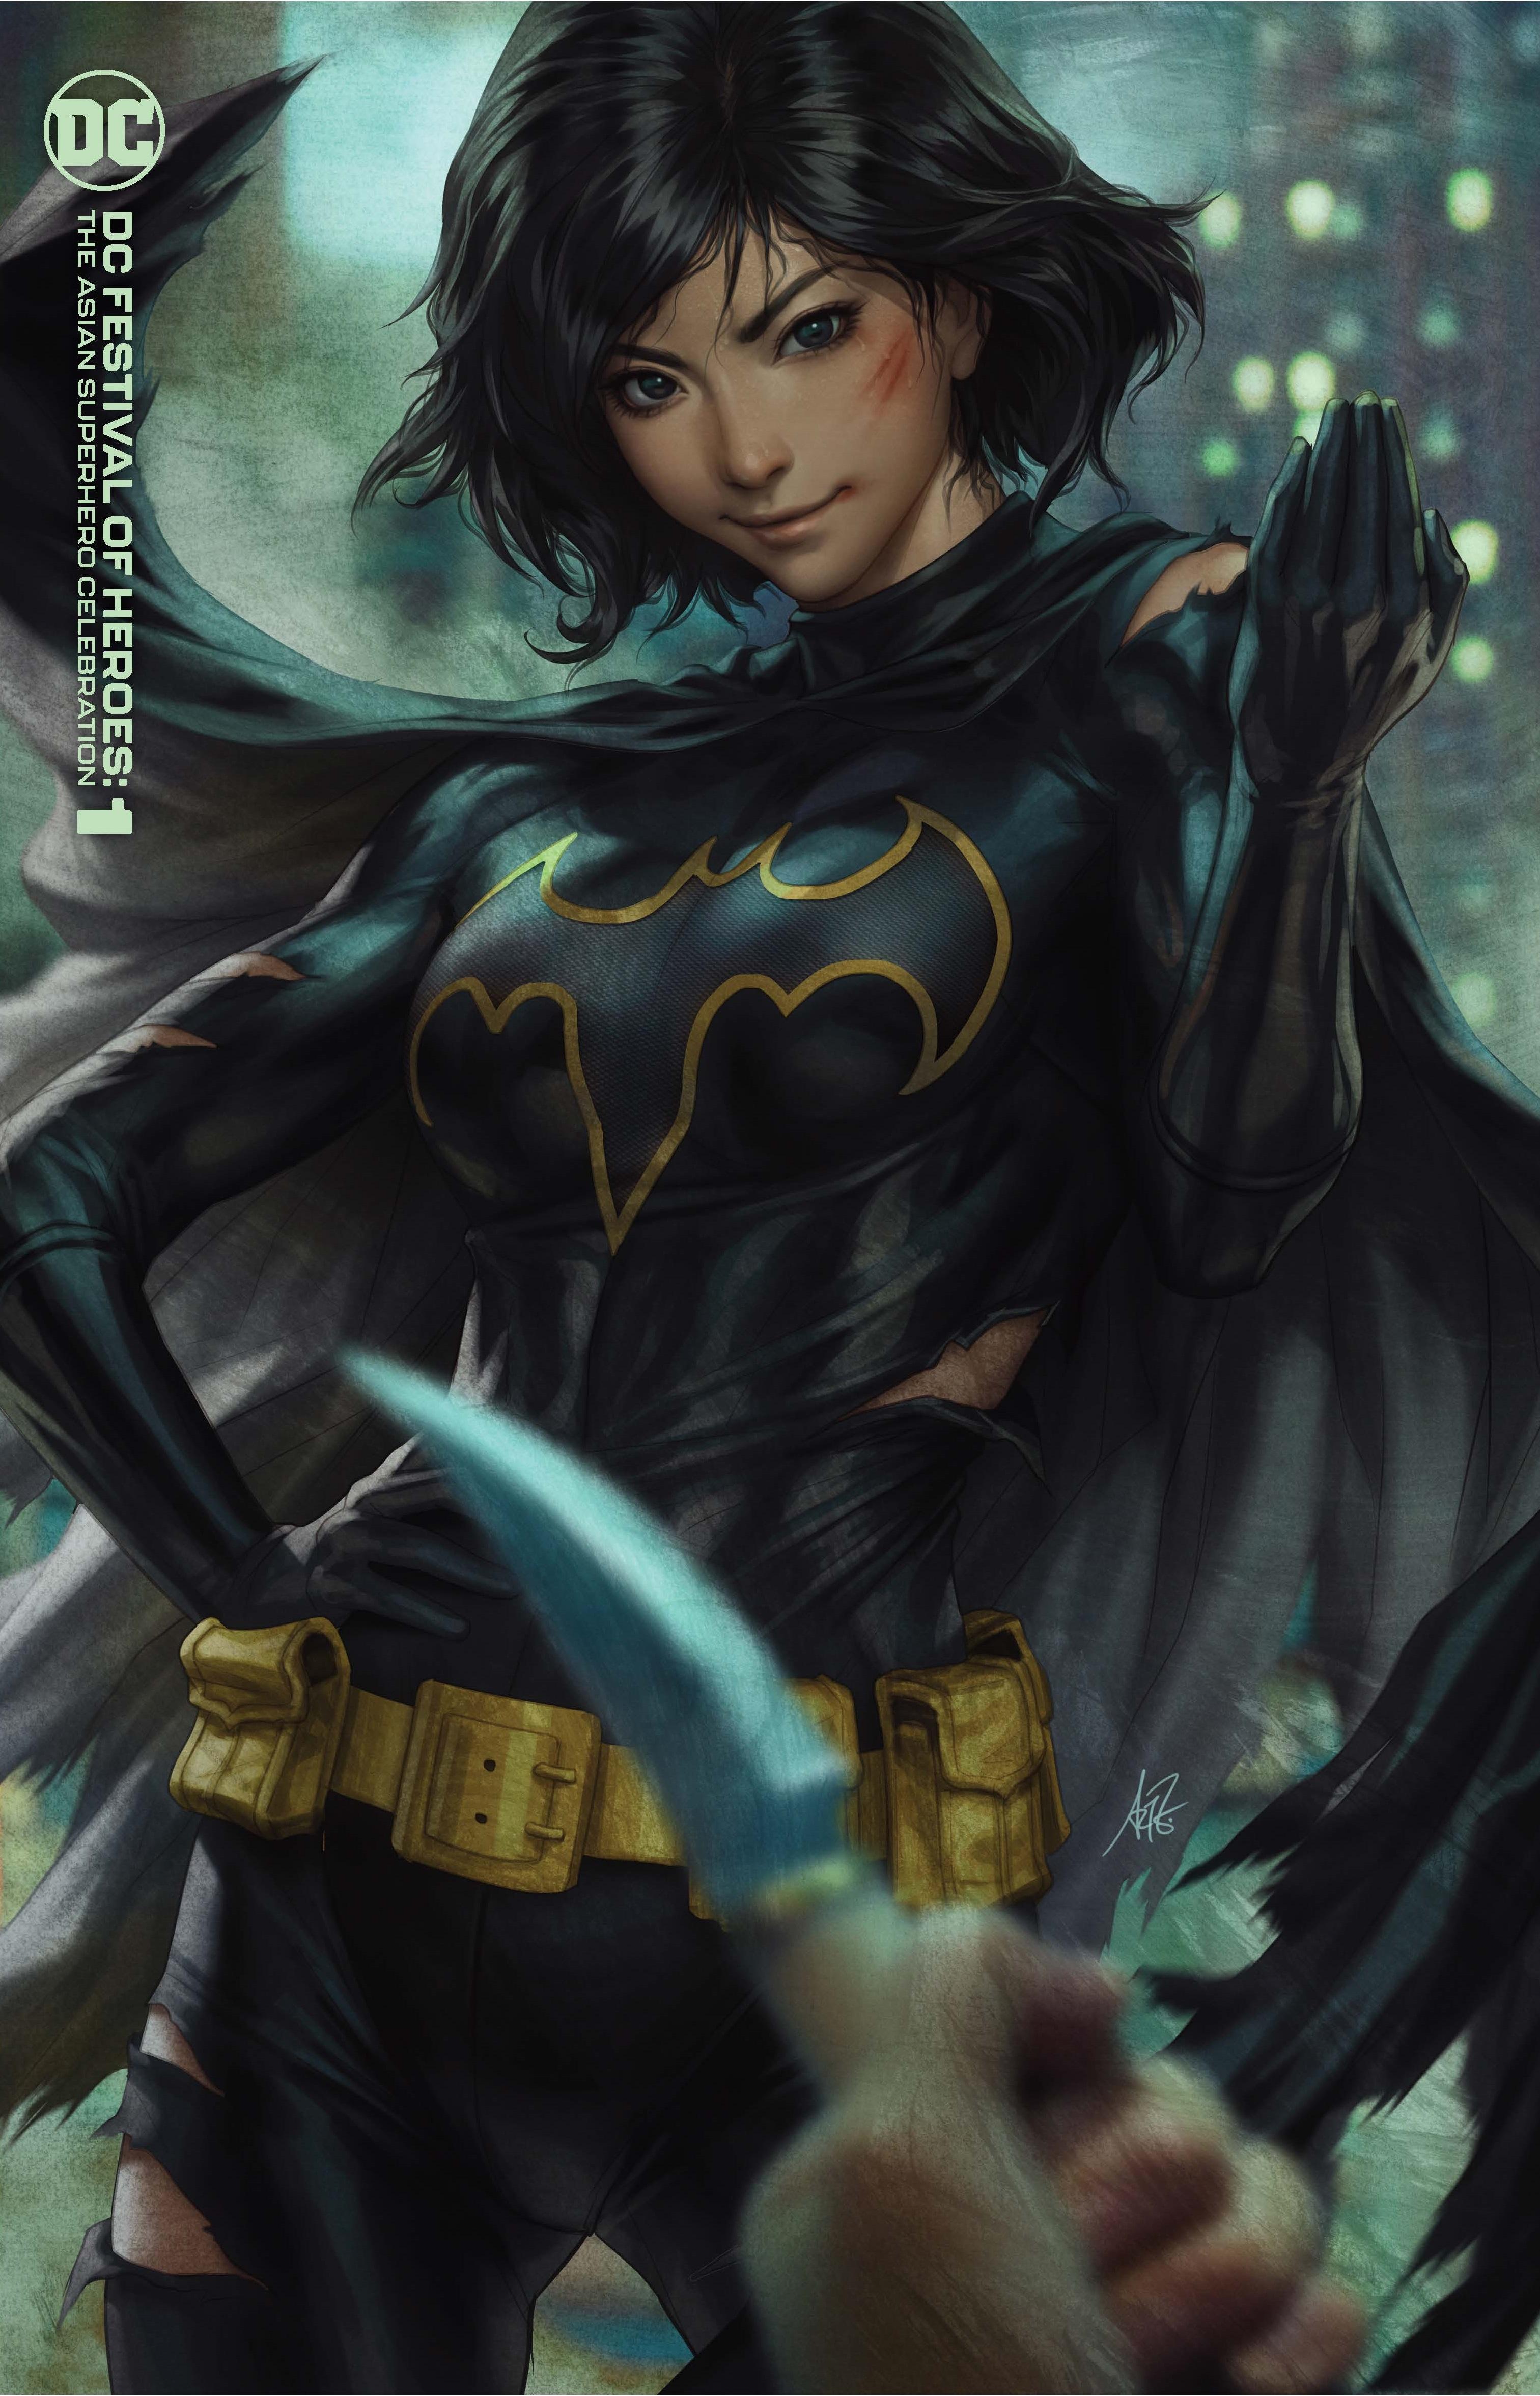 DC Festival of Heroes: The Asian Superhero Celebration - Cassandra Cain - graphic image